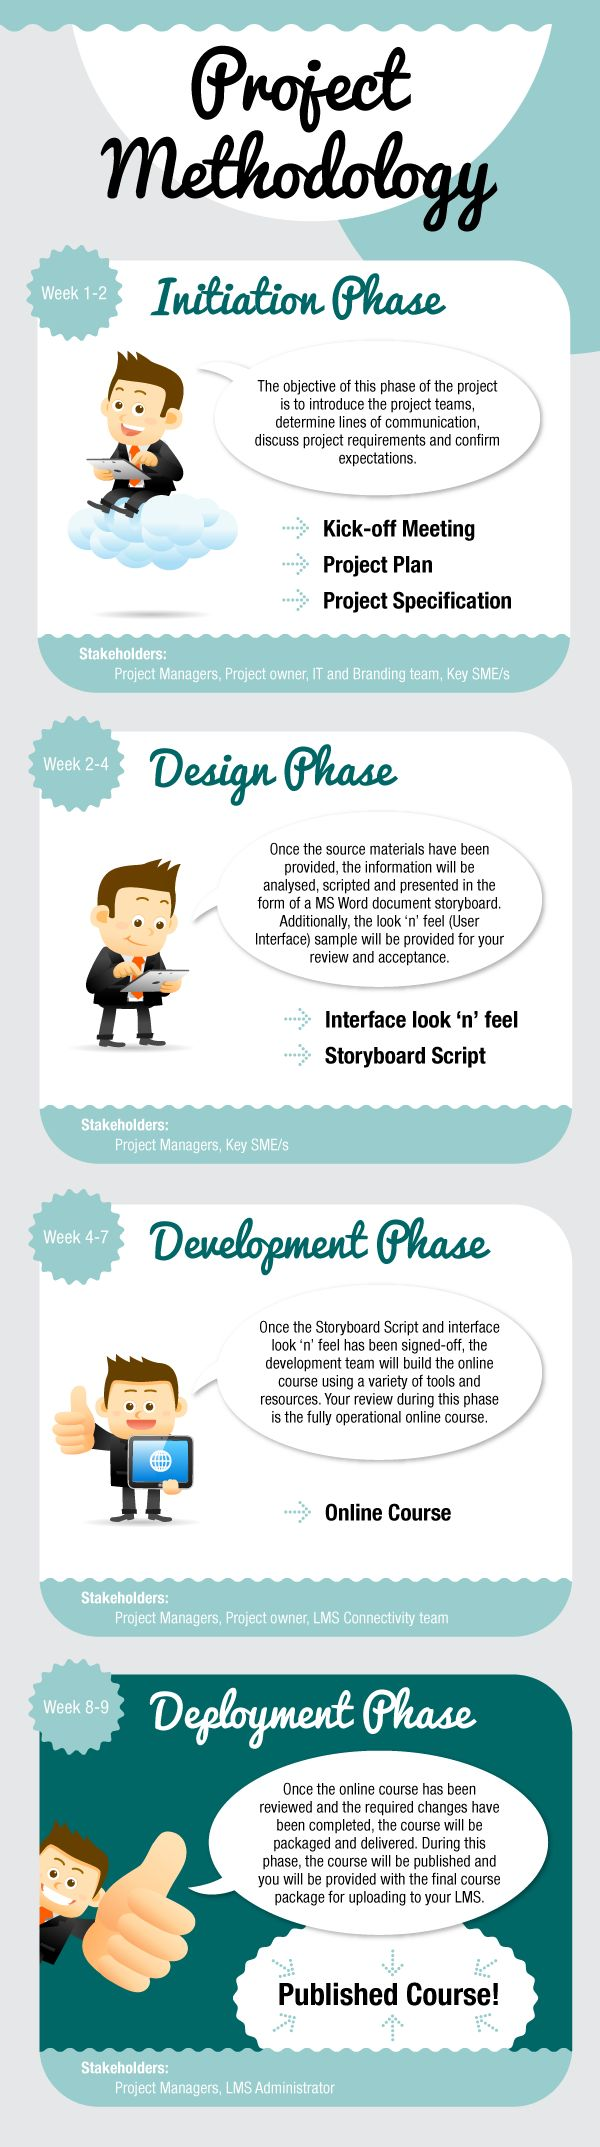 Project Methodology Summary